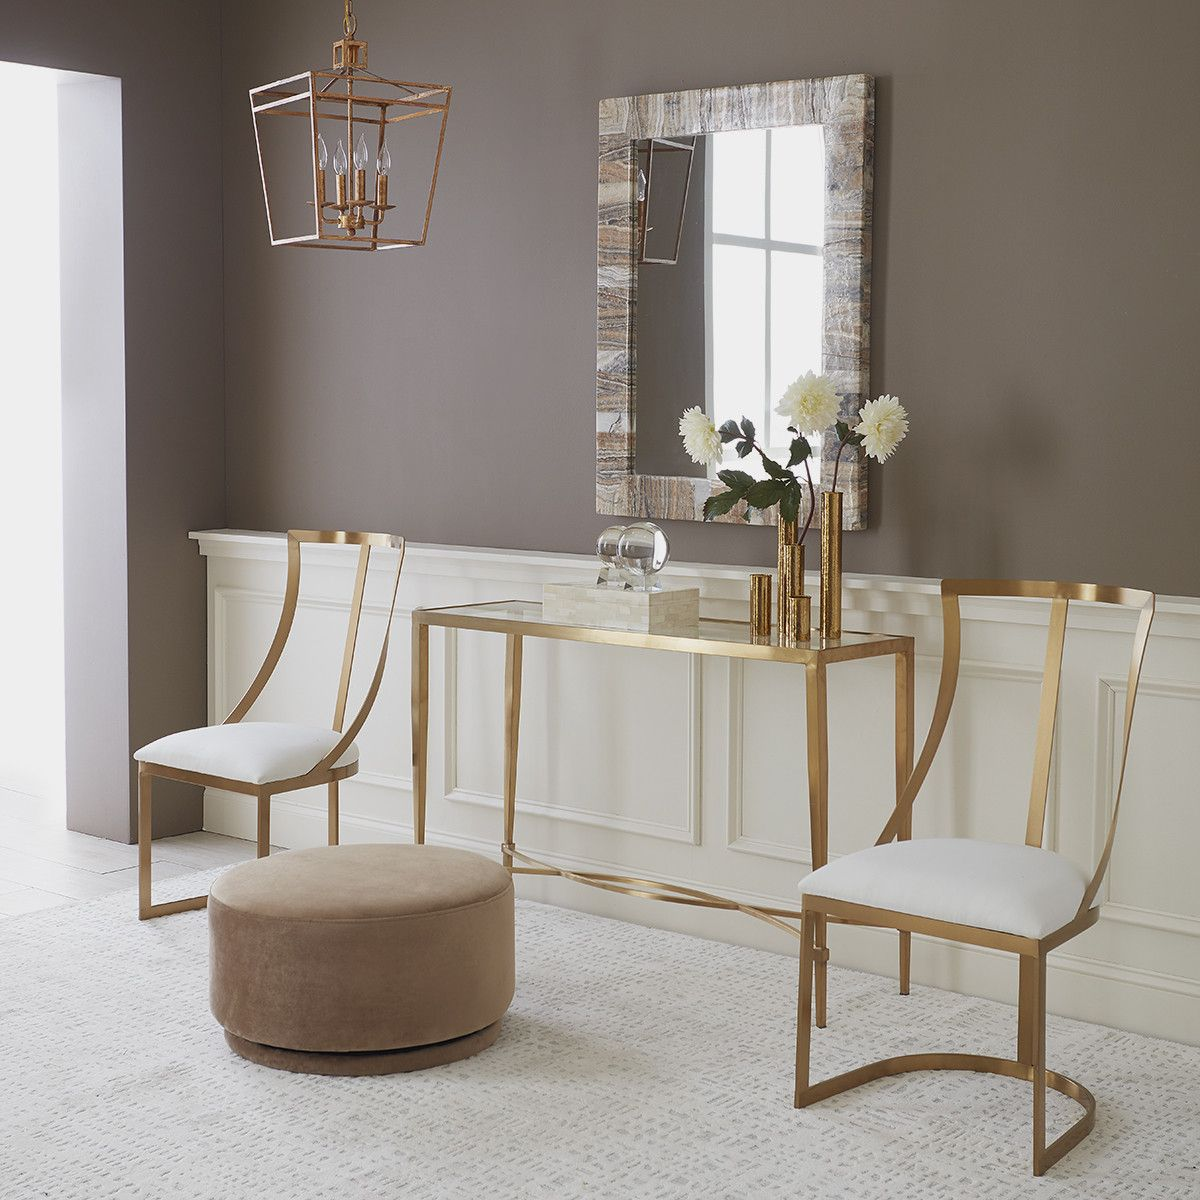 Striated Sardonyx Stone Mirror Wisteria Living Room Decor Apartment Space Saving Dining Room Gold Living Room